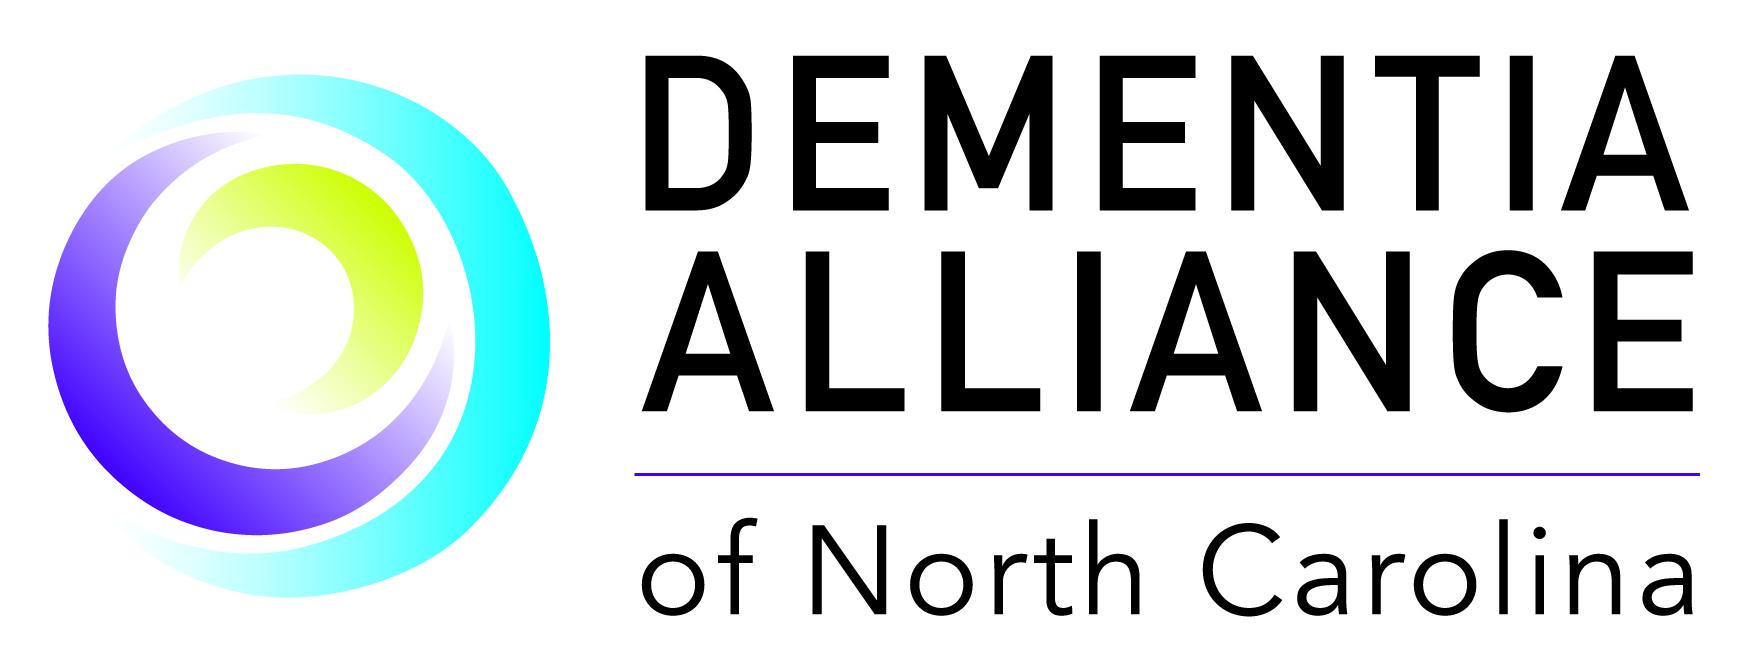 dementia alliance of north carolina